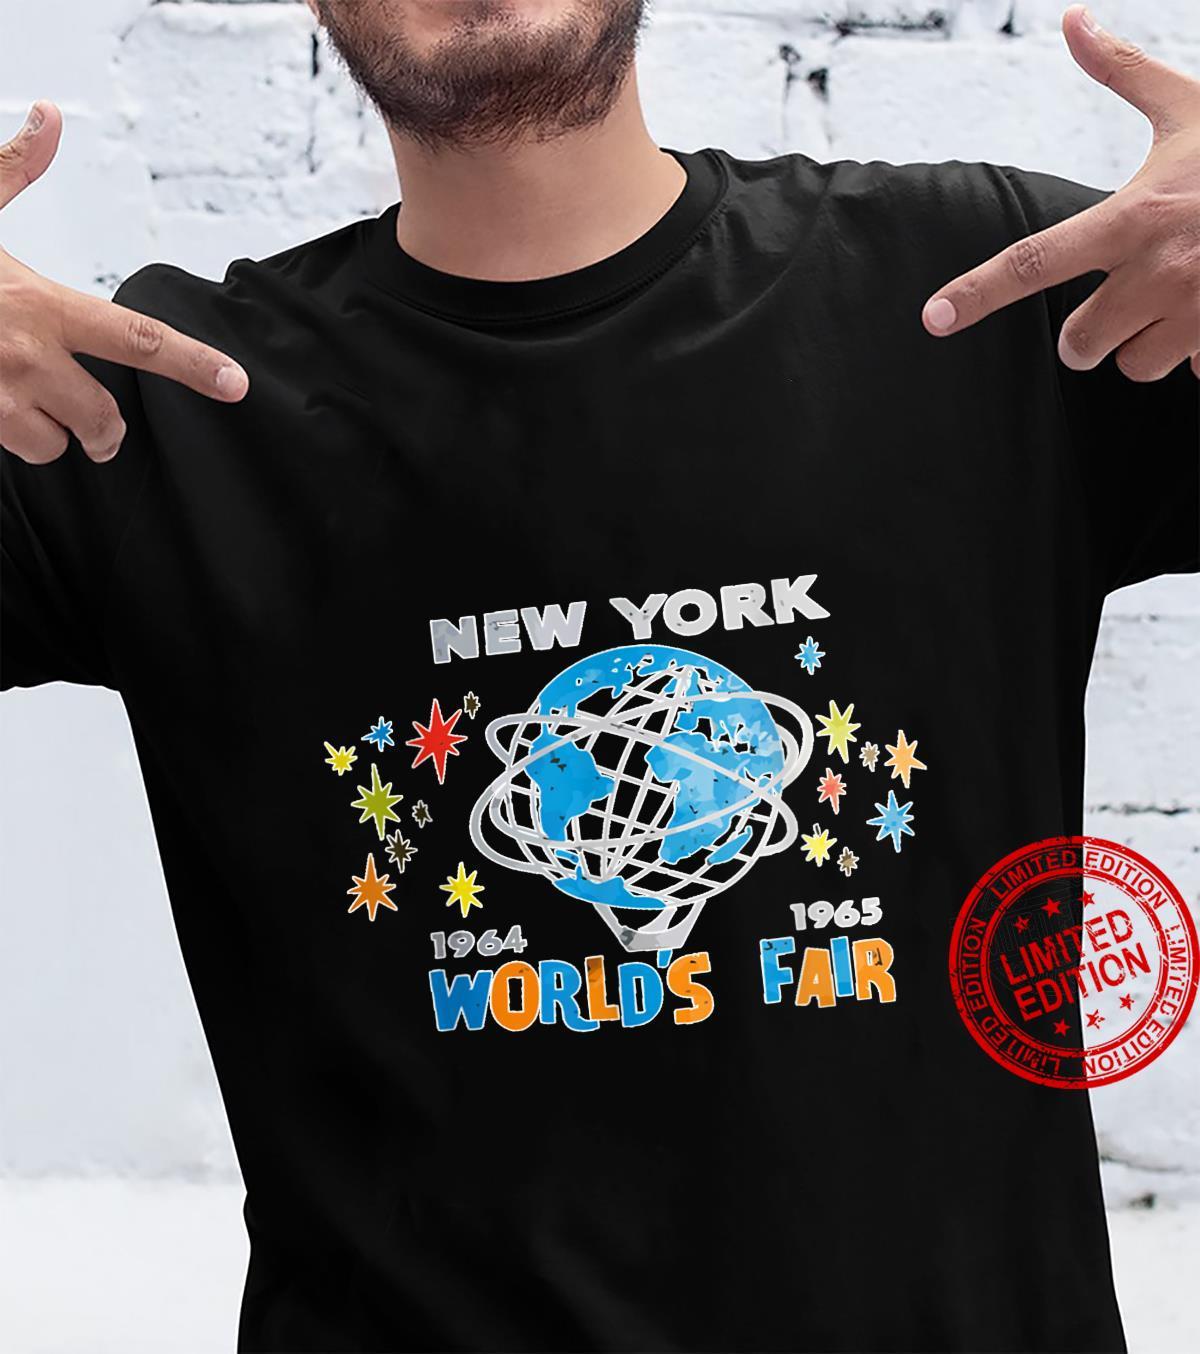 NewYorkWorldsFair19641965Tshirt Shirt